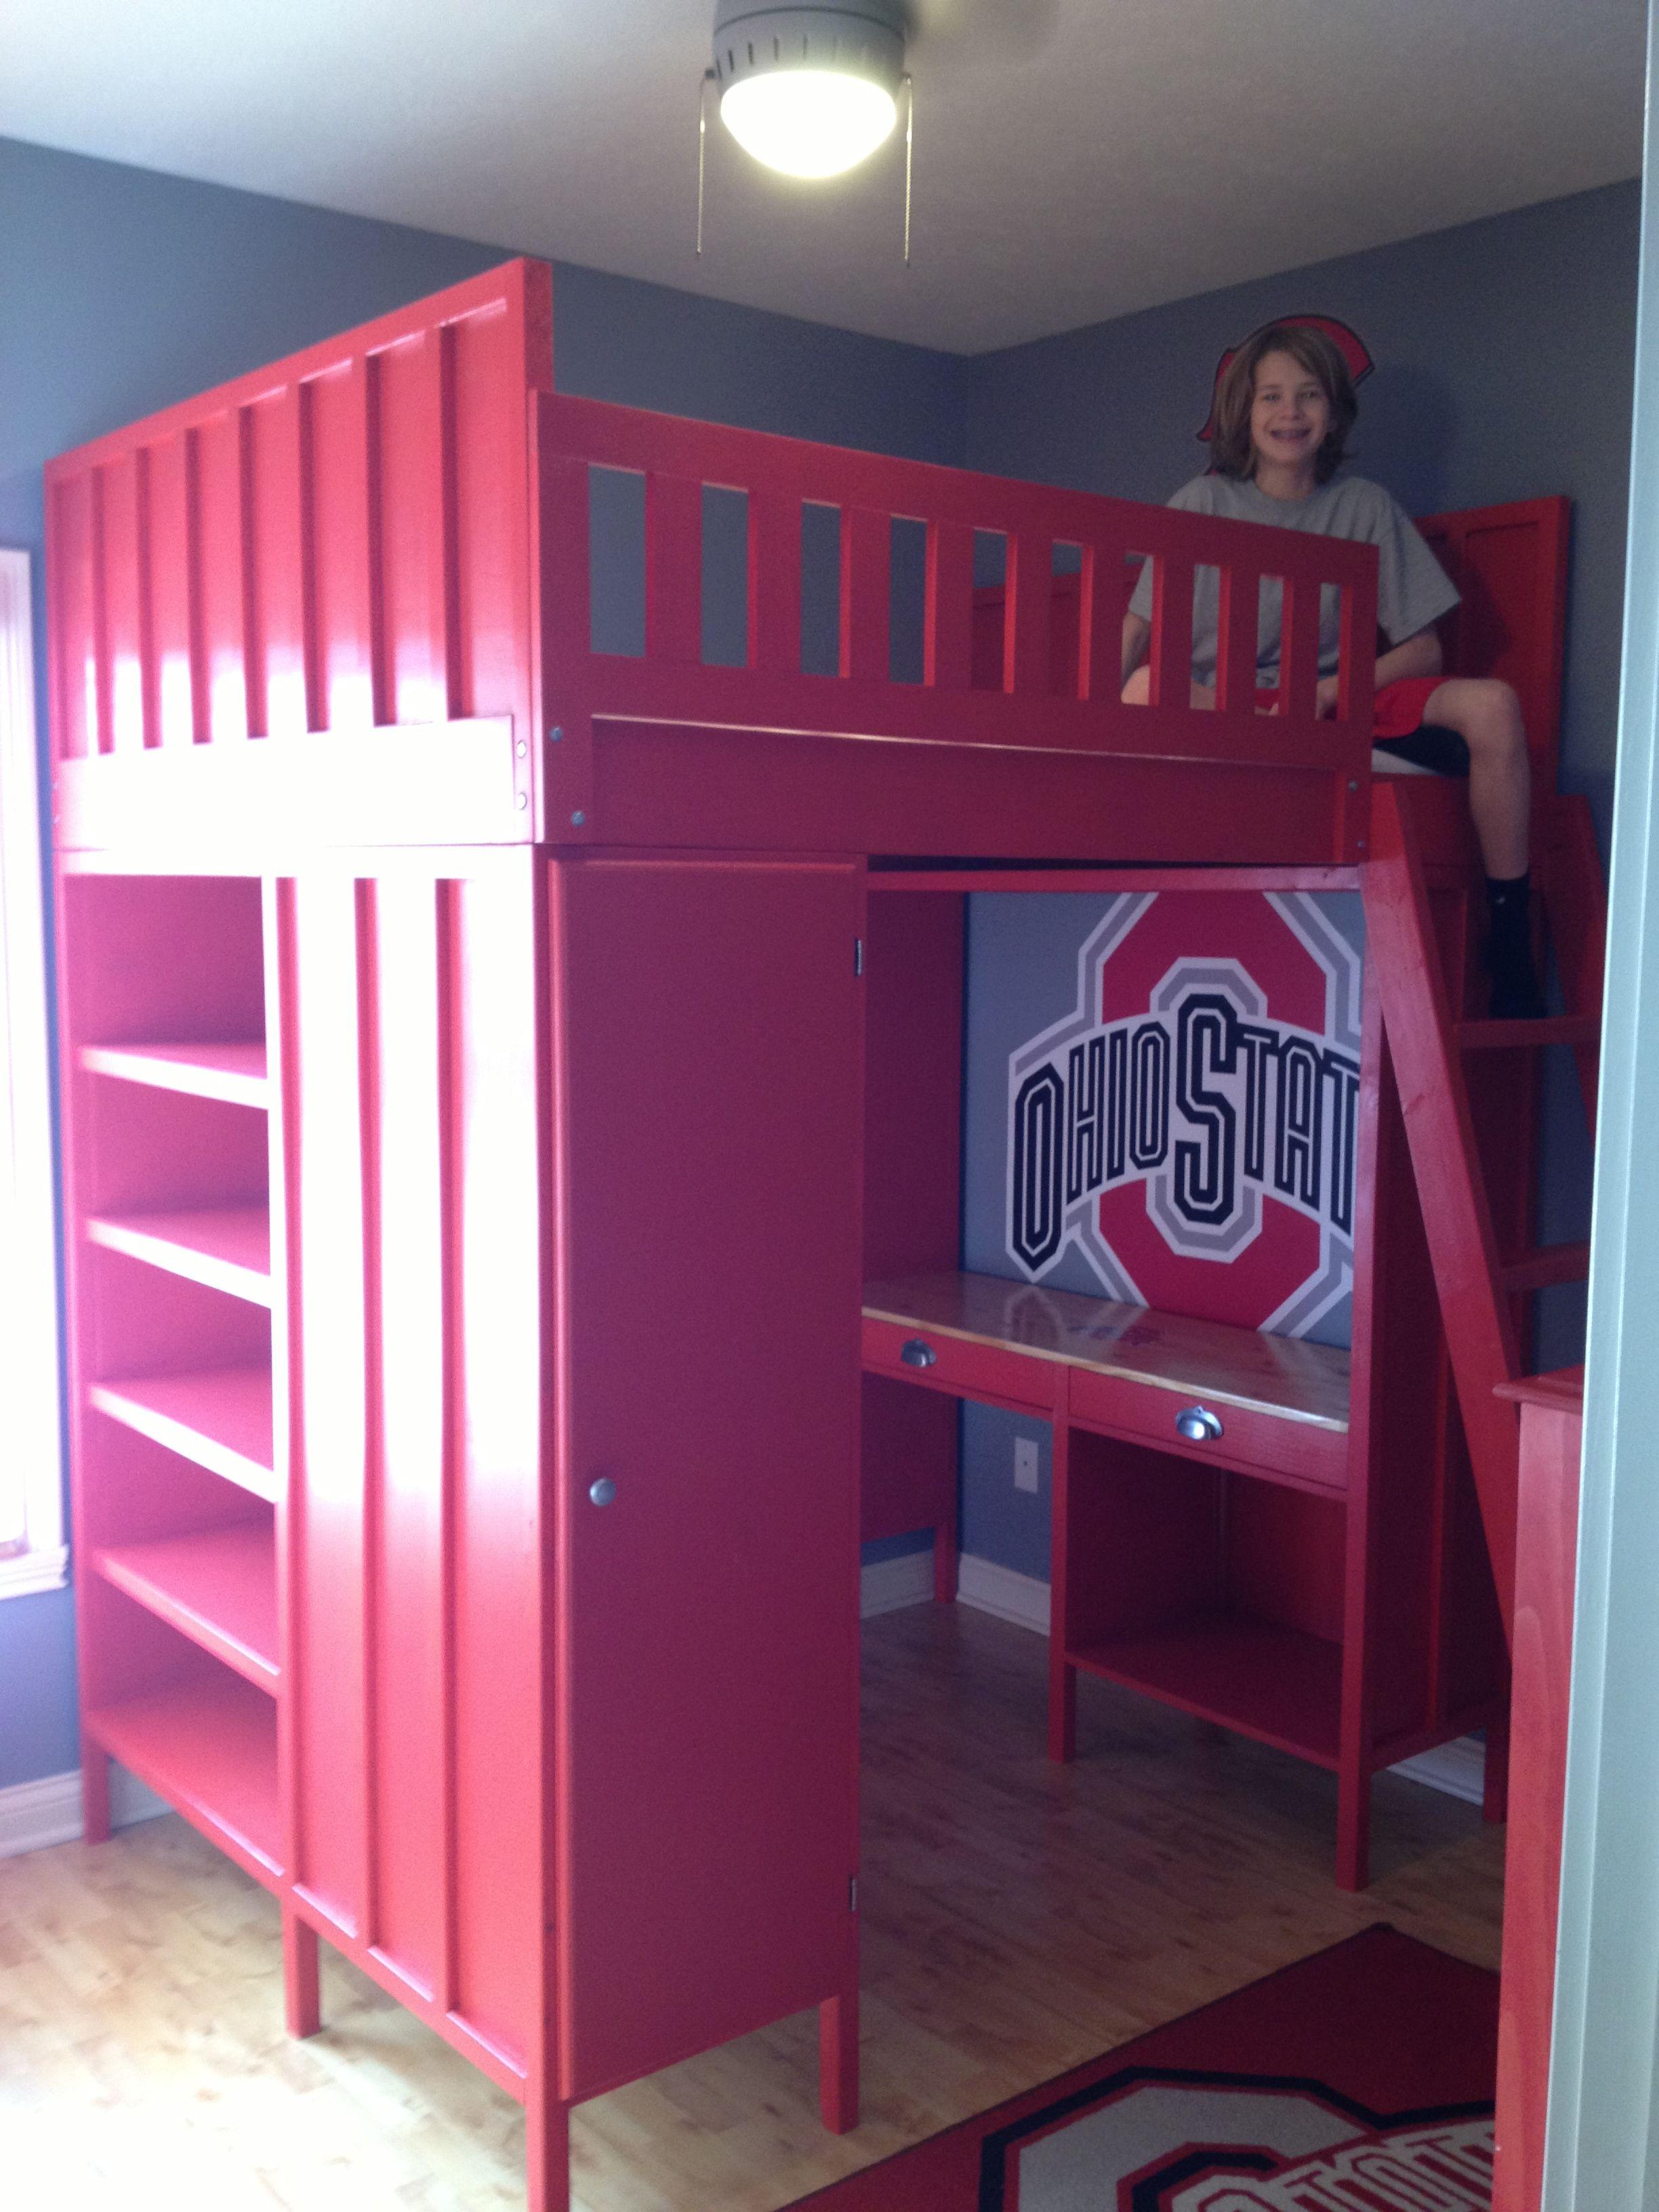 Diy kids loft bed plans  Ana White  Cabin Loft Bed OSU Design  DIY Projects  Domus